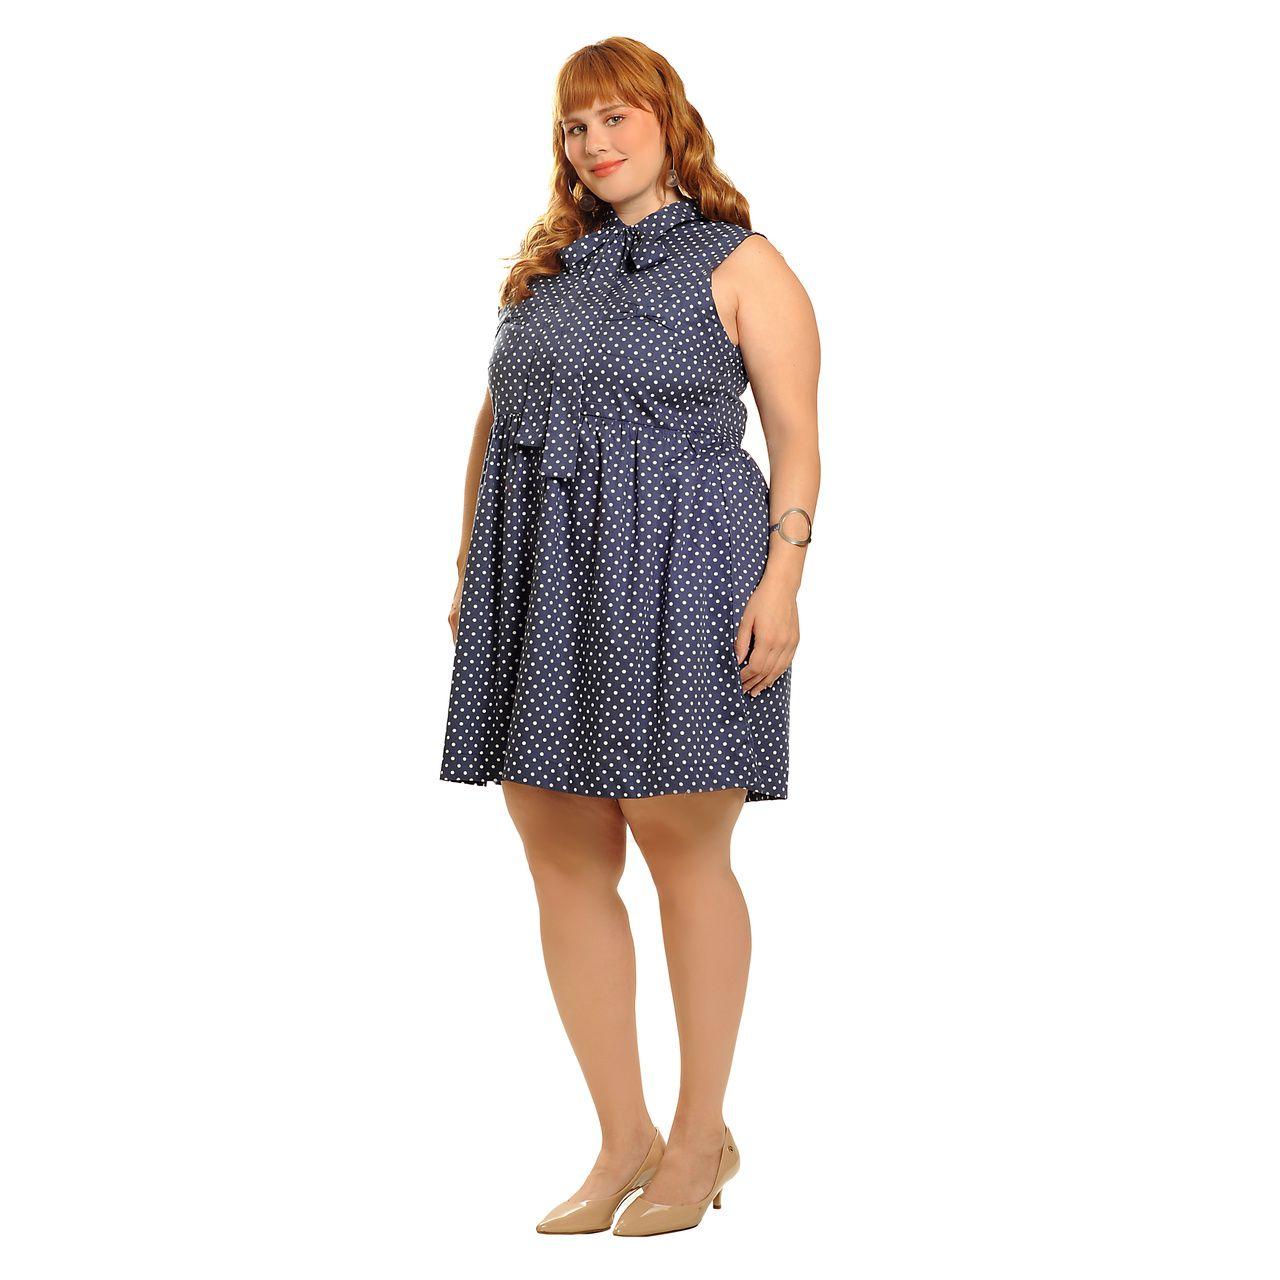 Vestido poá vintage azul plus size